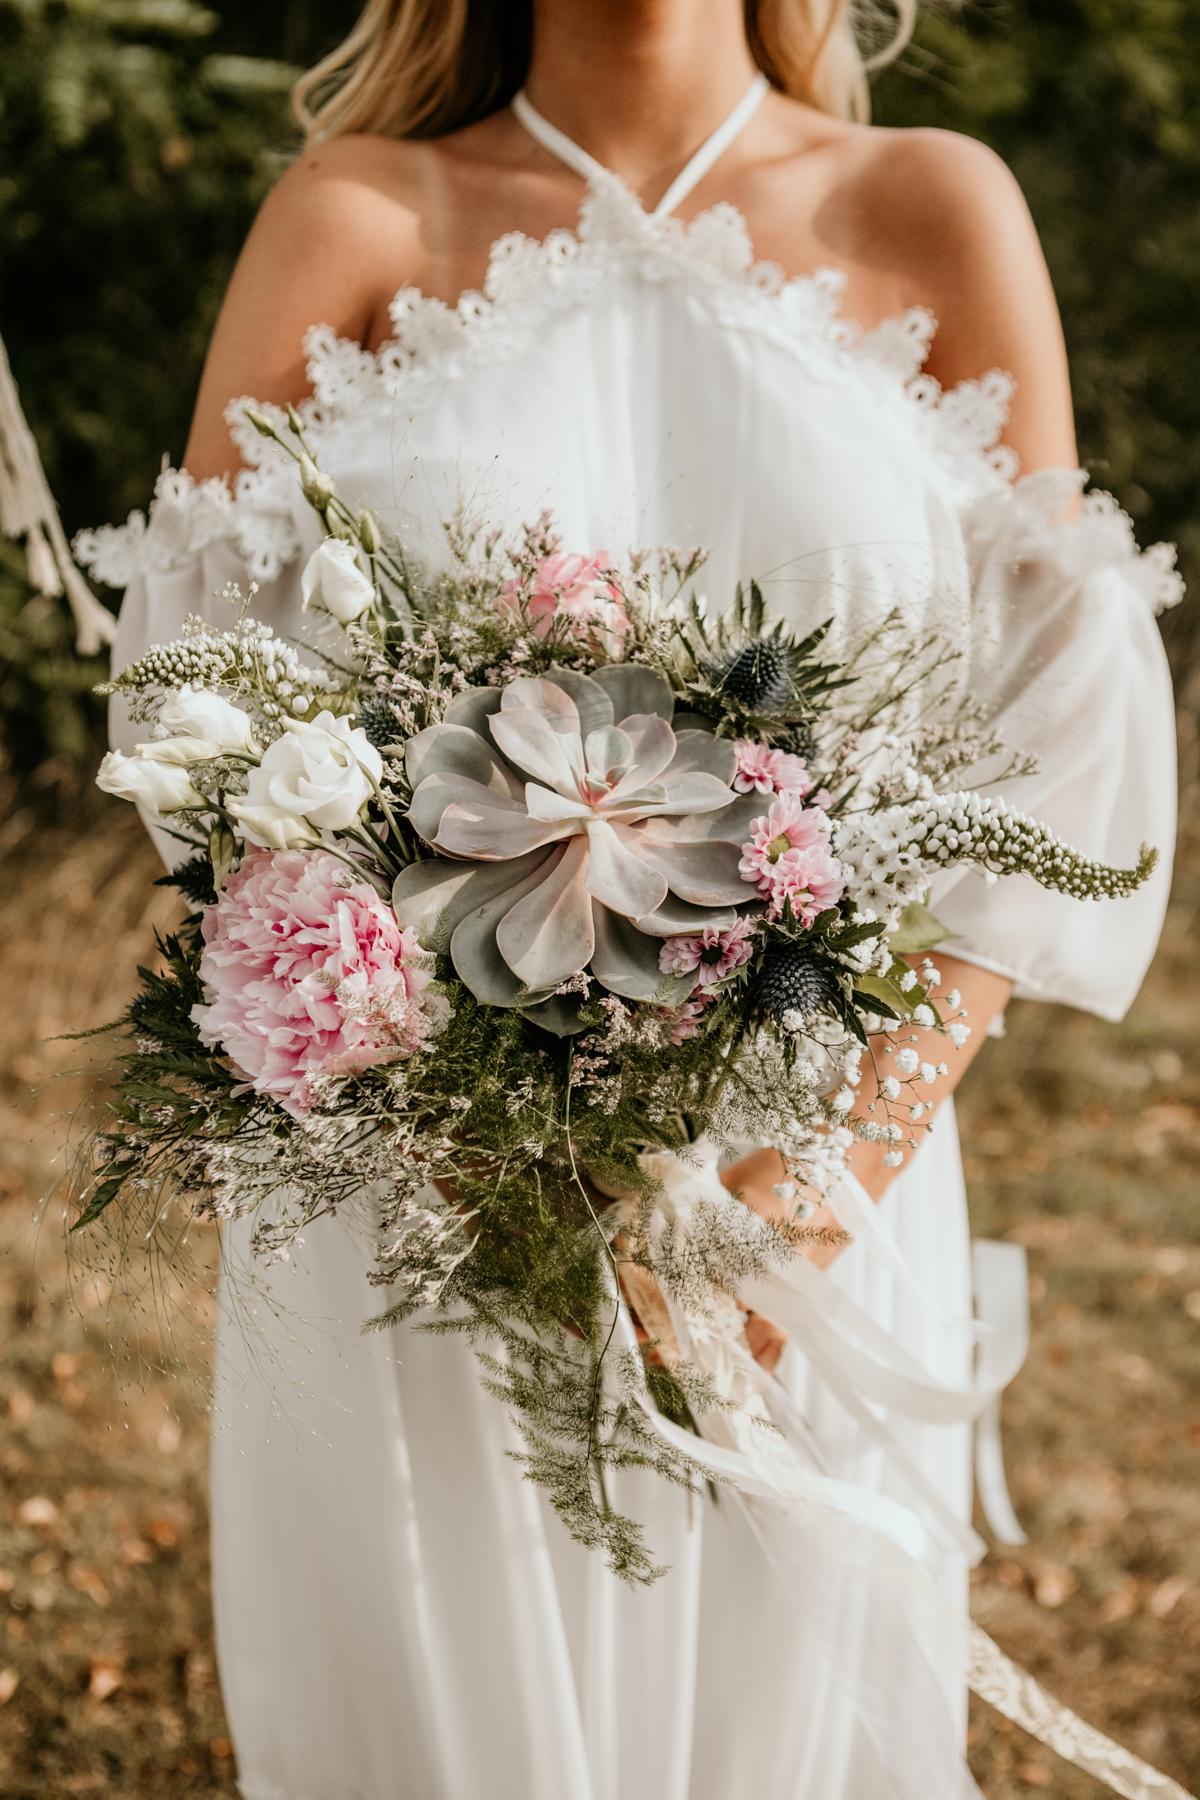 Styled Wedding 1 beeld.schoon-selinderella klein formaat-36